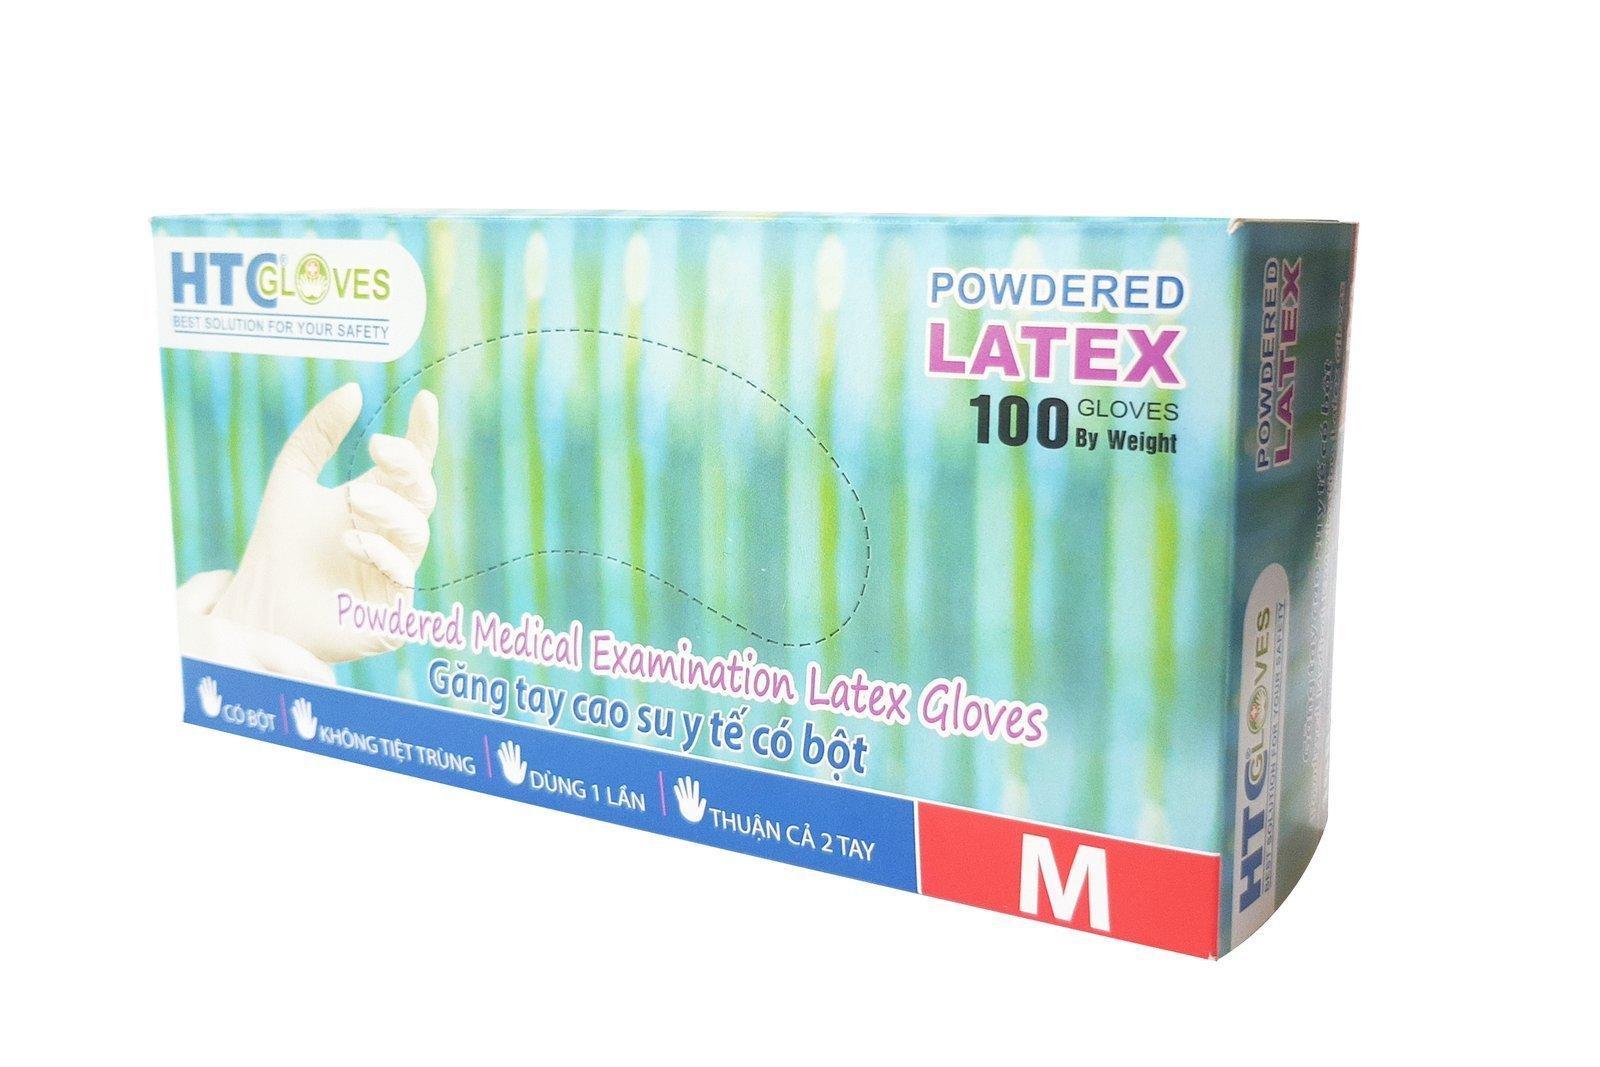 HTCGloves Medical Handschuhe Latex Pulver Größe M 100 Stck